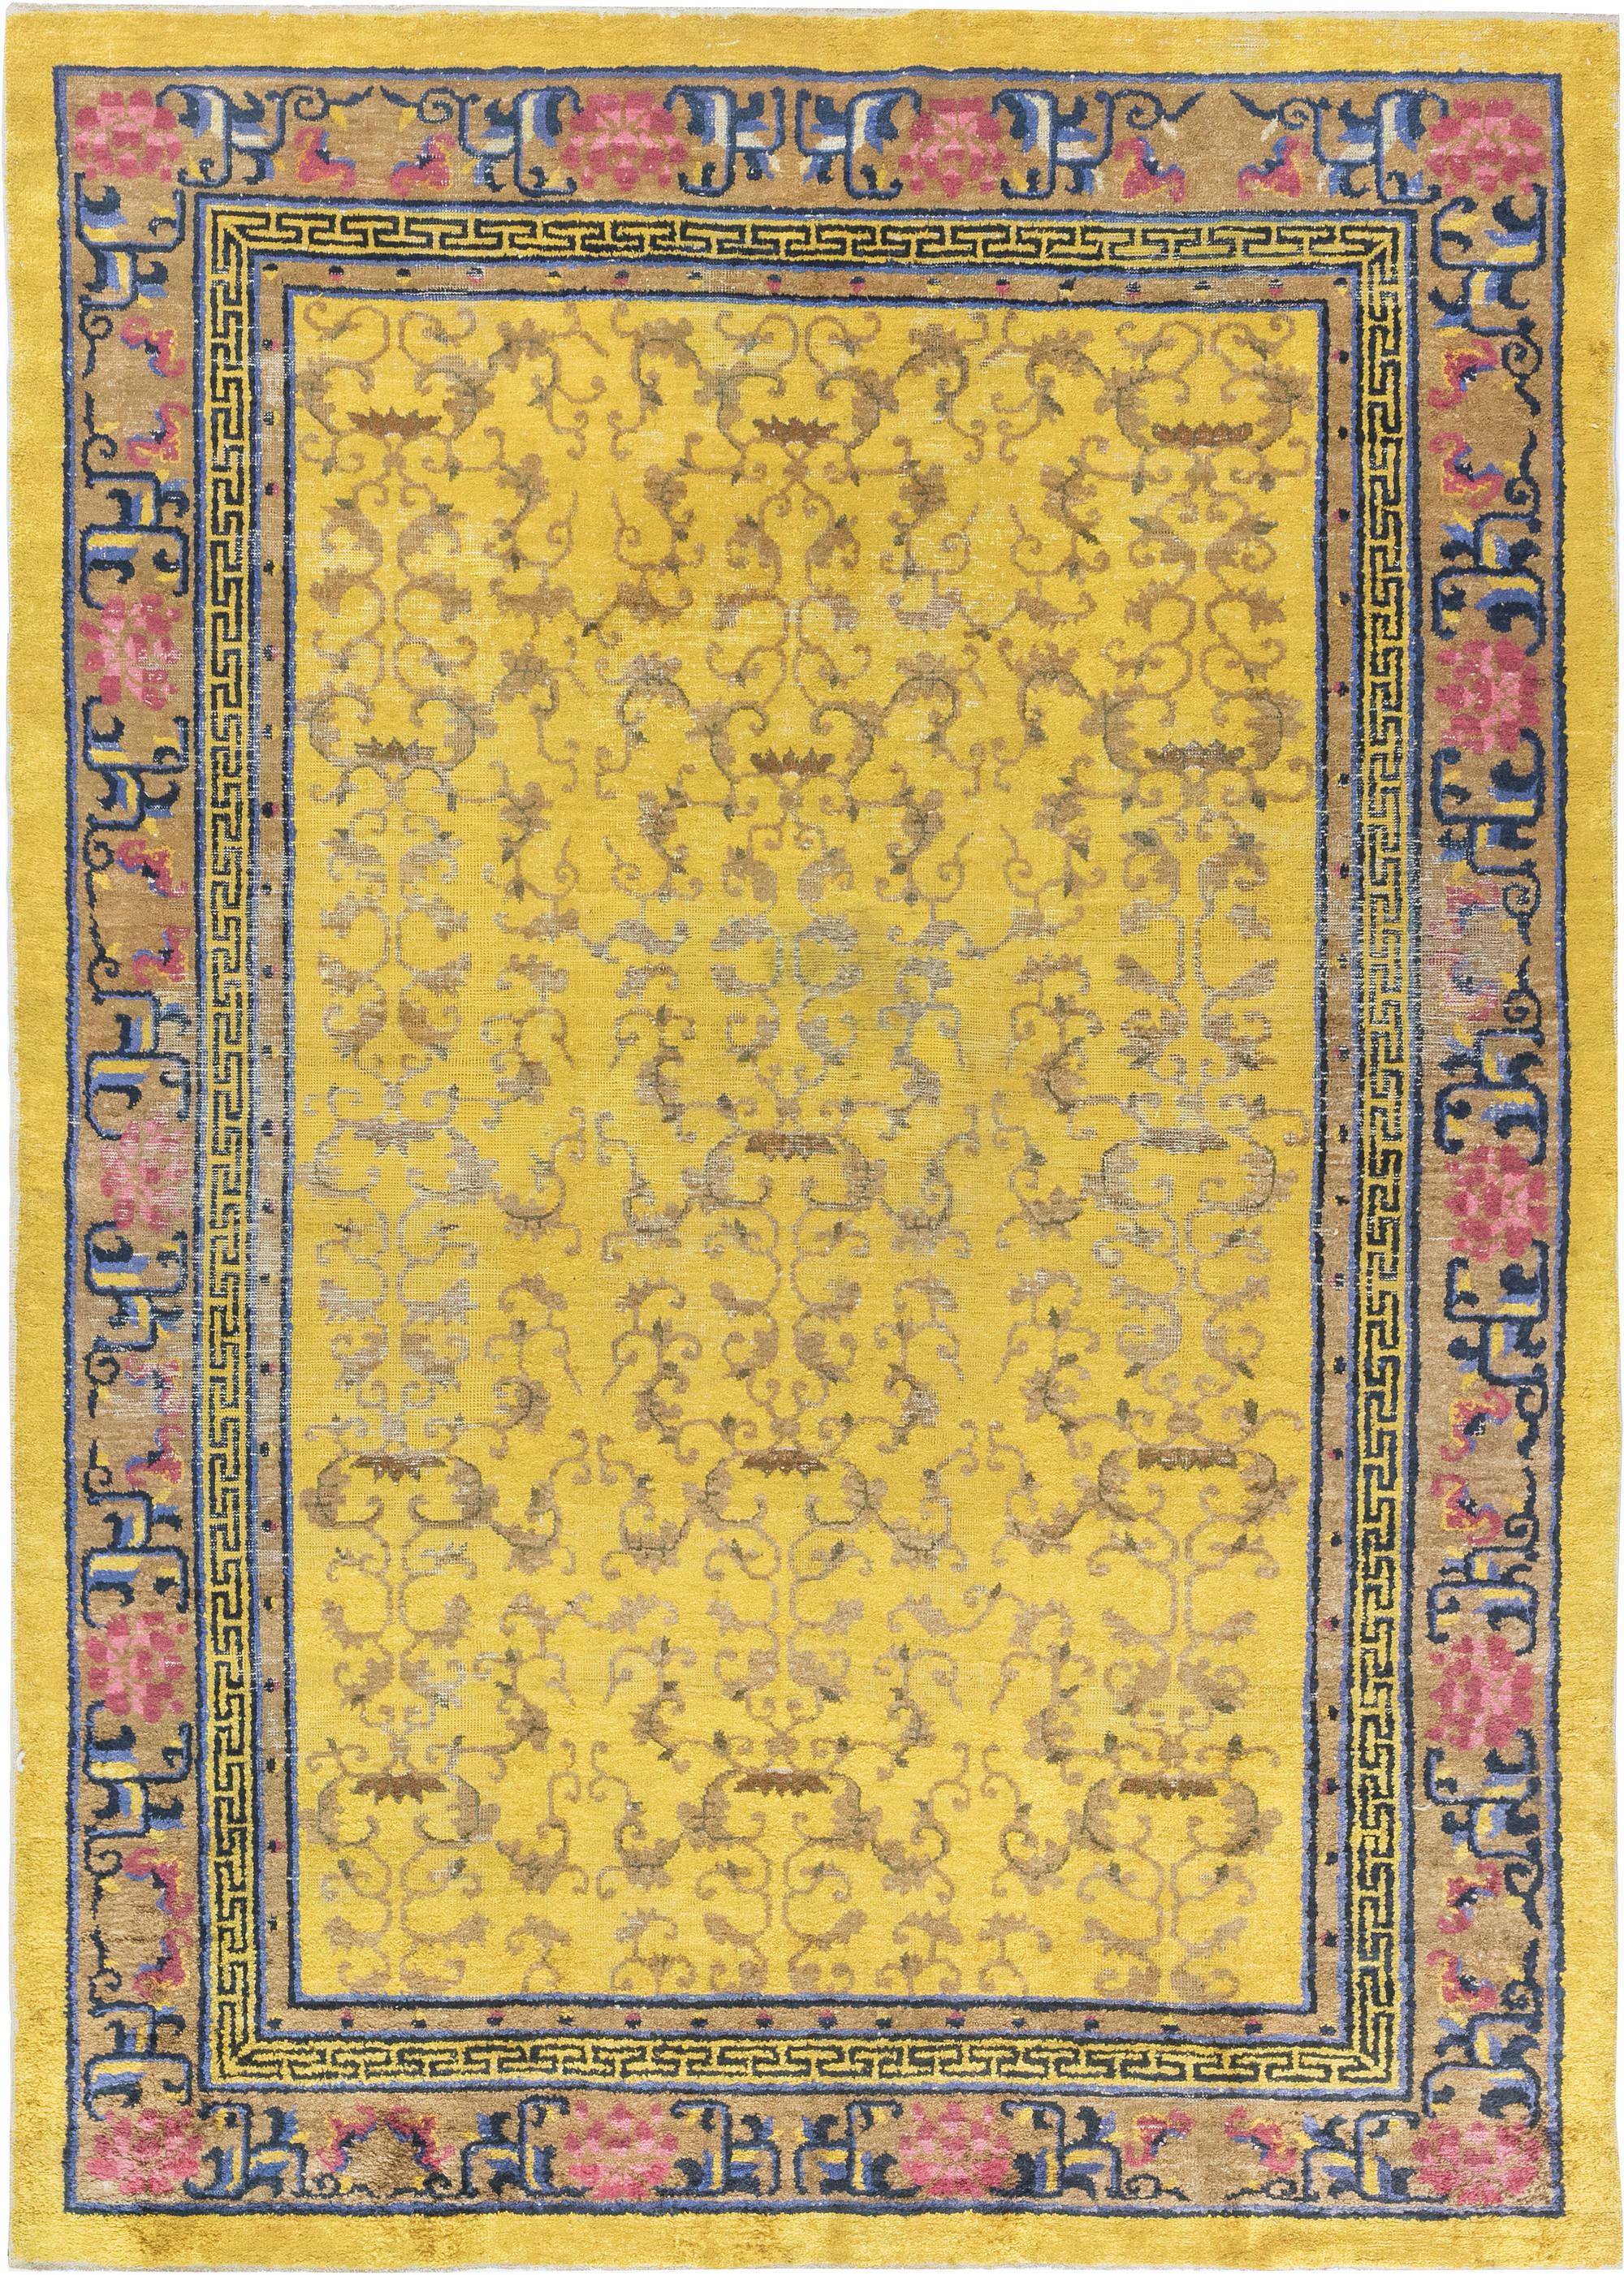 Antique Silk Chinese Rug BB6903